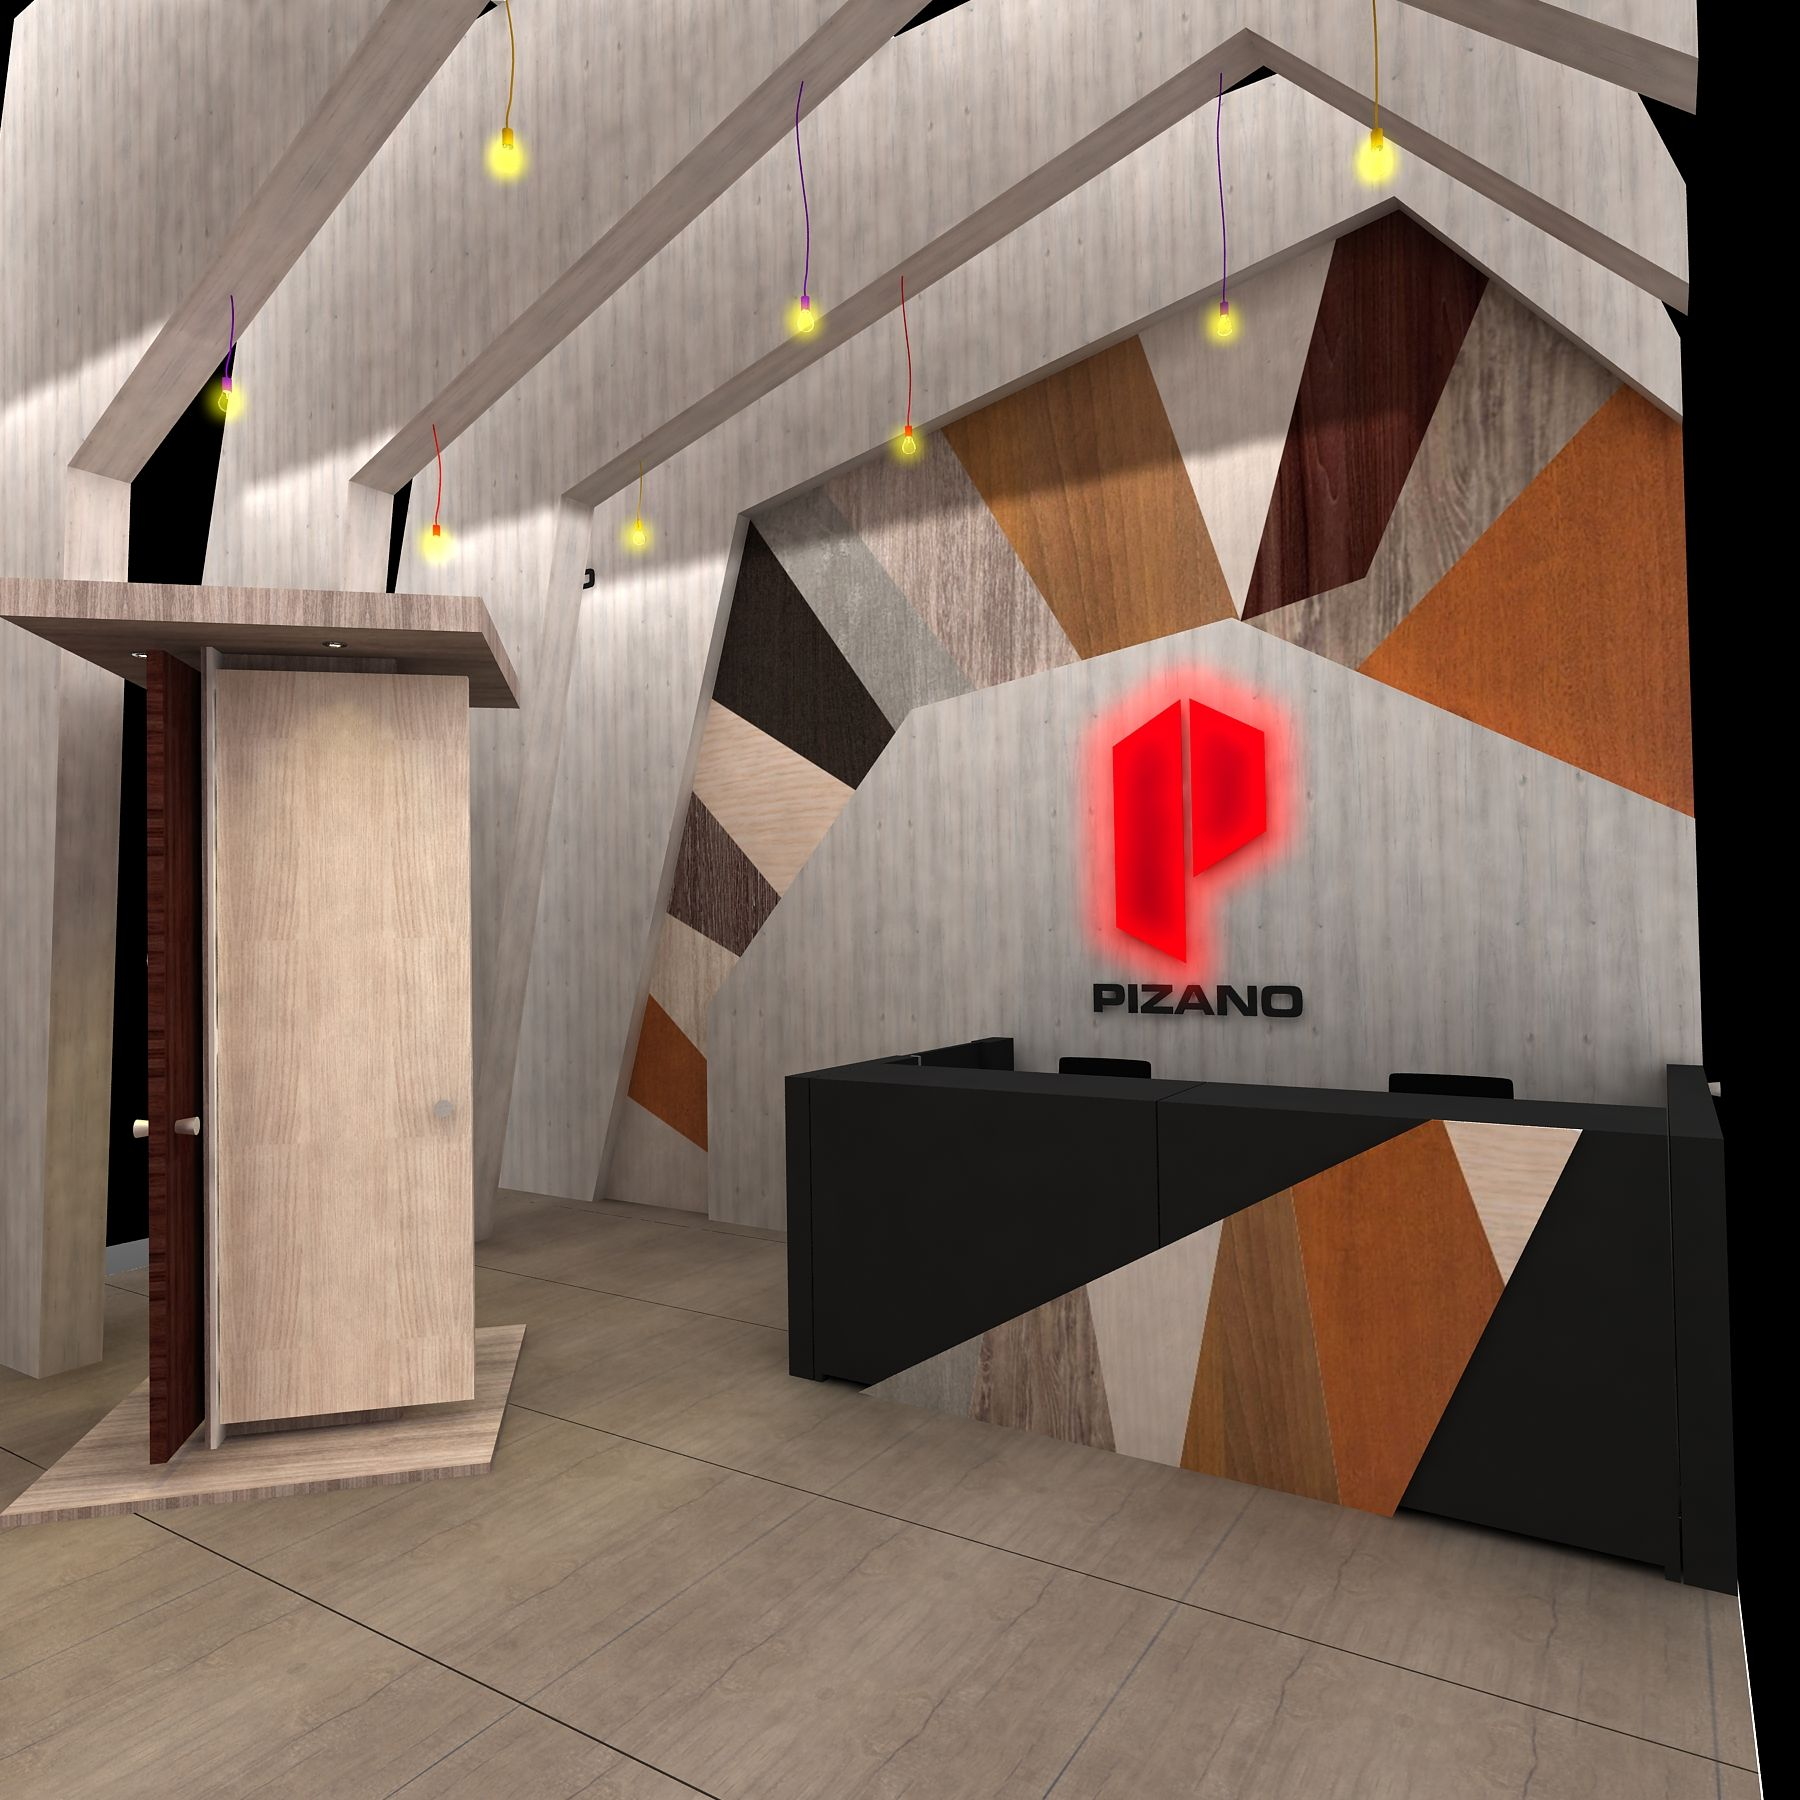 Muebles Pizano Bogota - Stand Pizano Feria Mueble Y Madera 2016 Bogot Mitocondria Gpm [mjhdah]https://s-media-cache-ak0.pinimg.com/originals/cb/65/84/cb65840c713b44c1948b962548670ea3.jpg